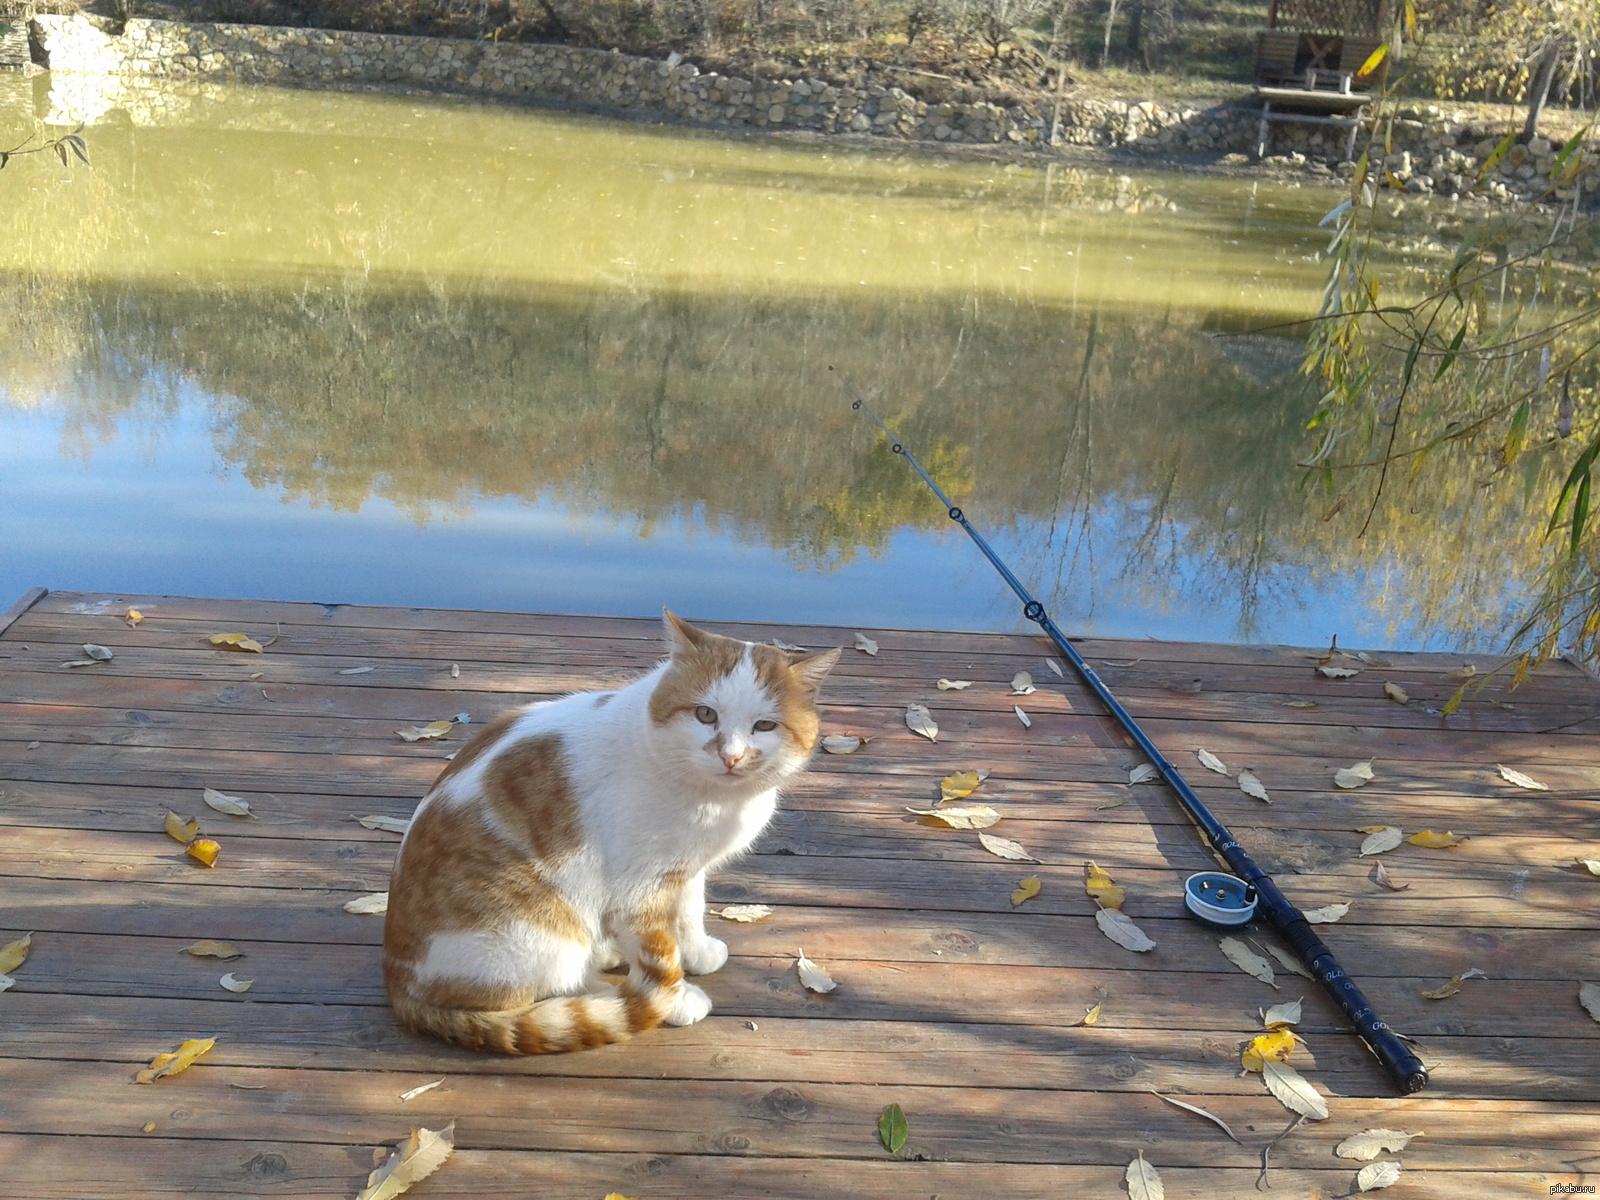 кот и рыбалка картинки для увидев фото новинки